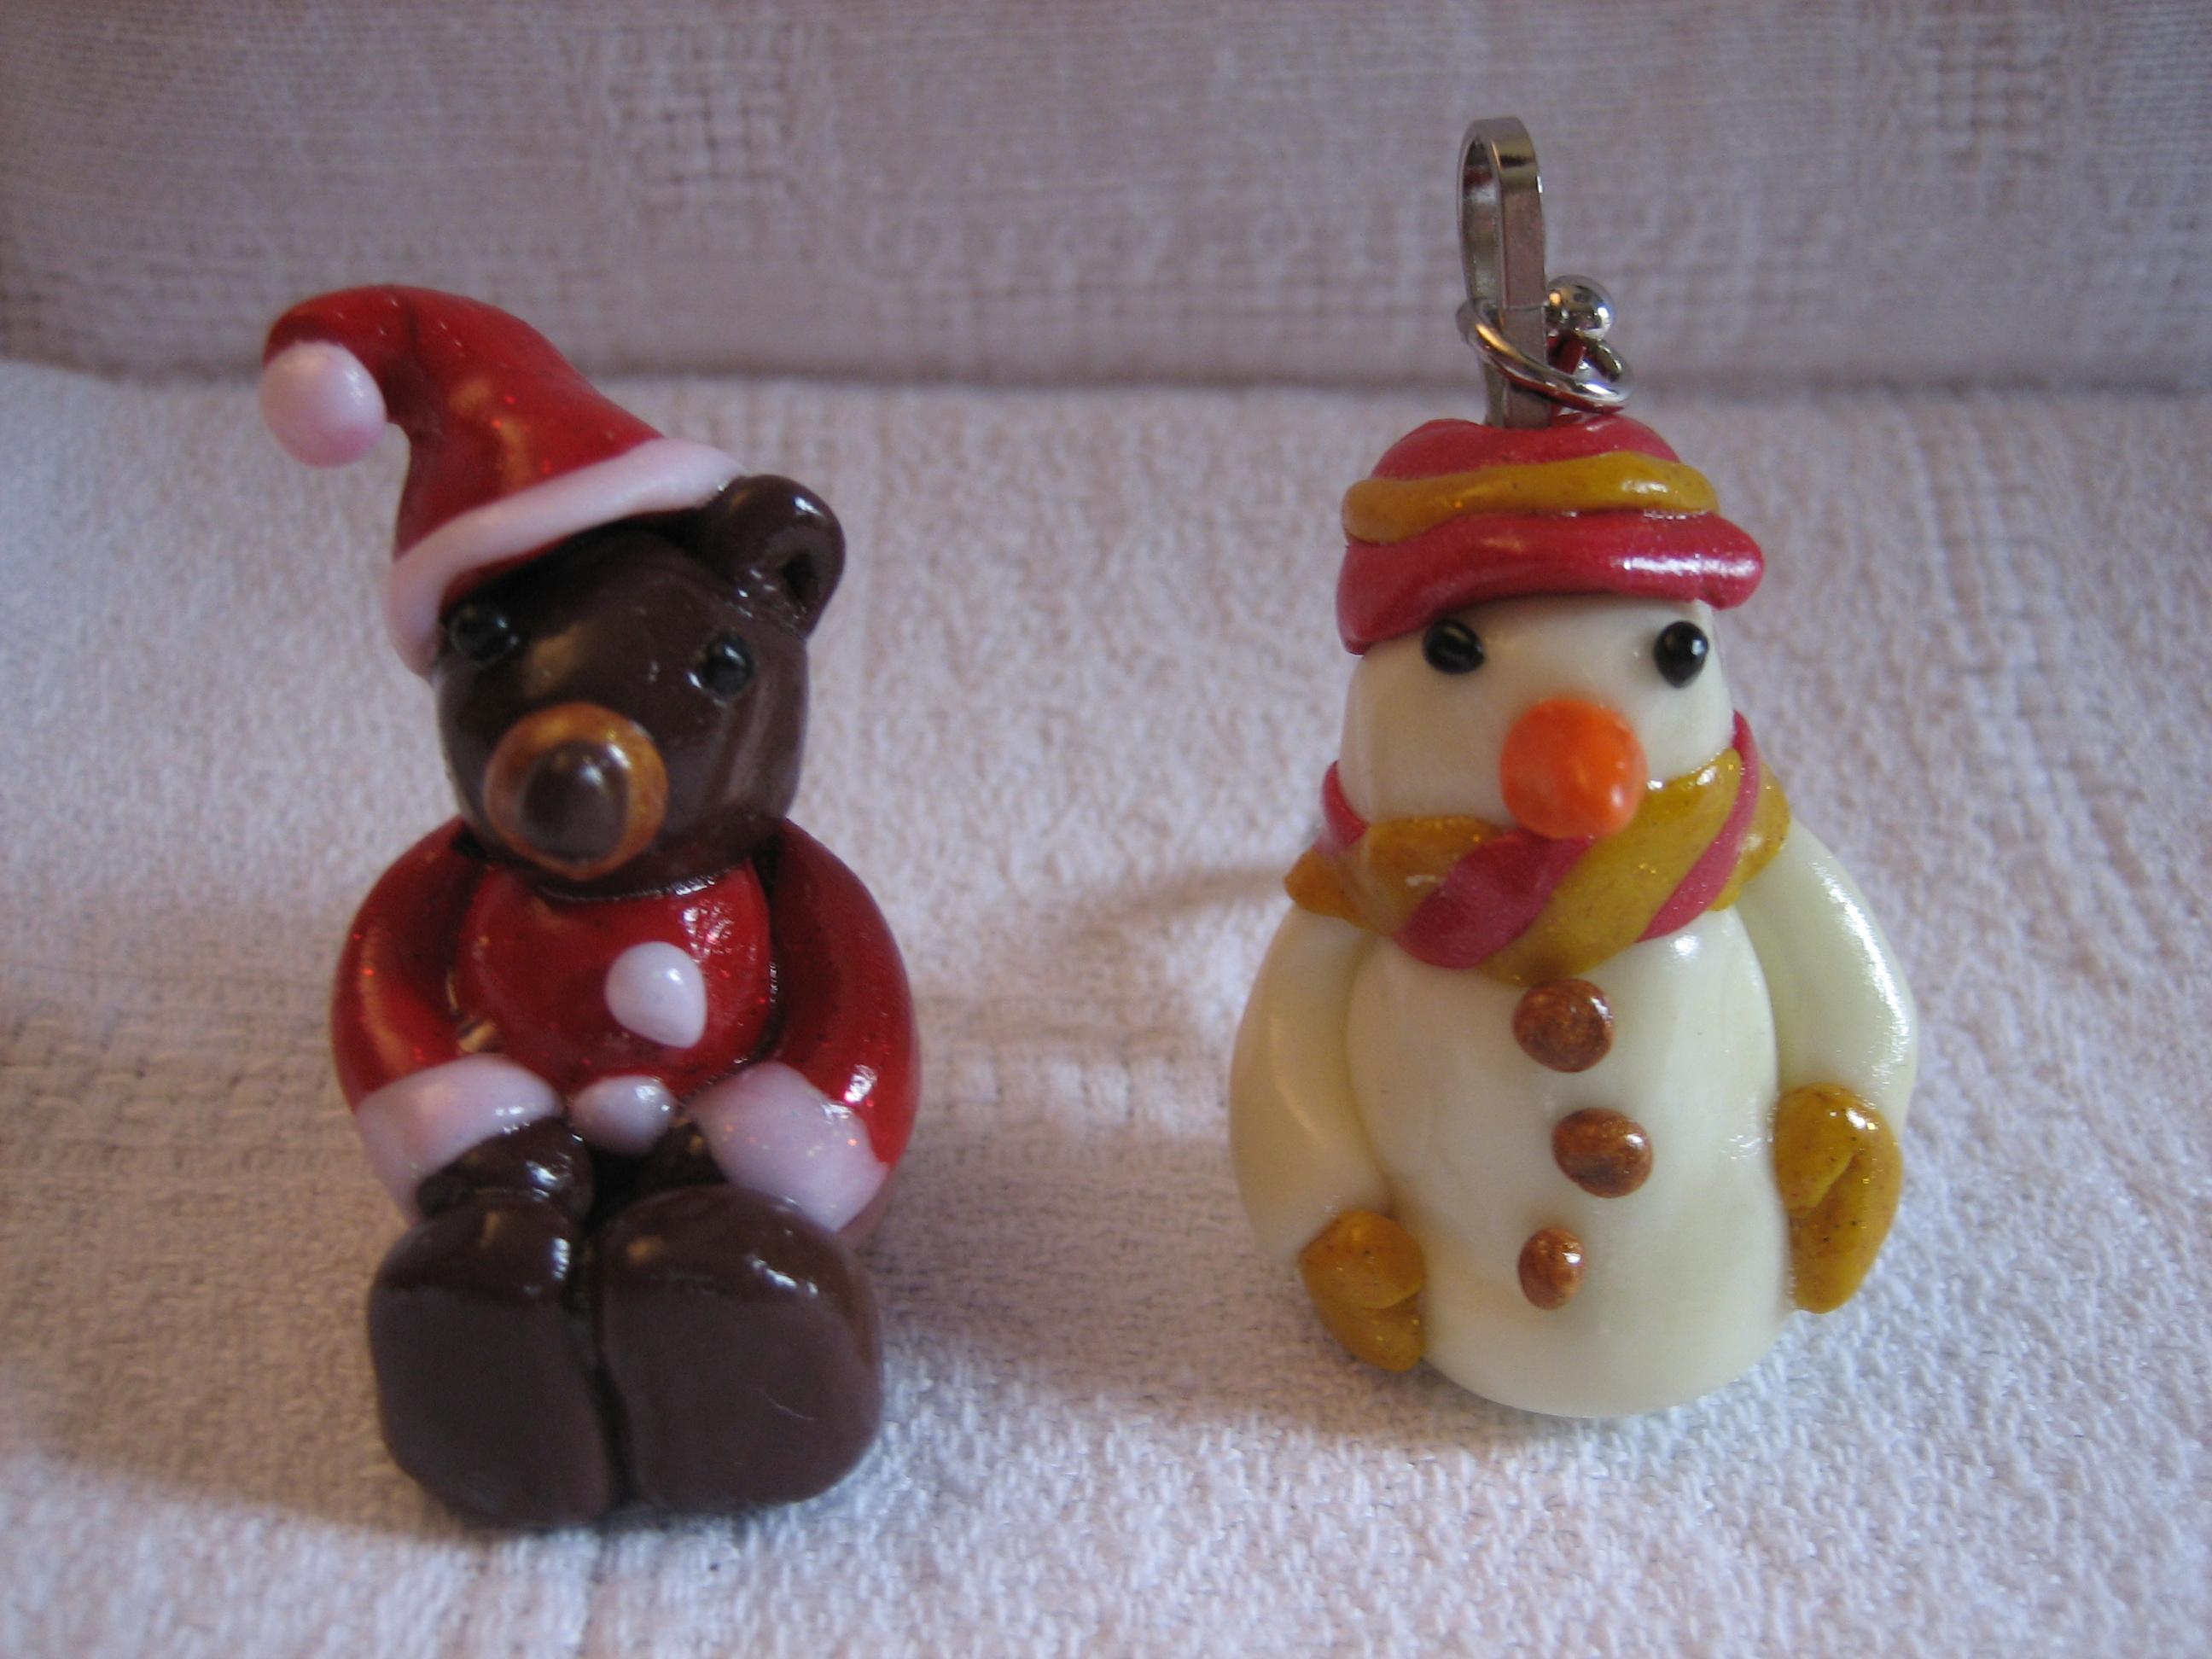 bonhomme de neige et ours de noel